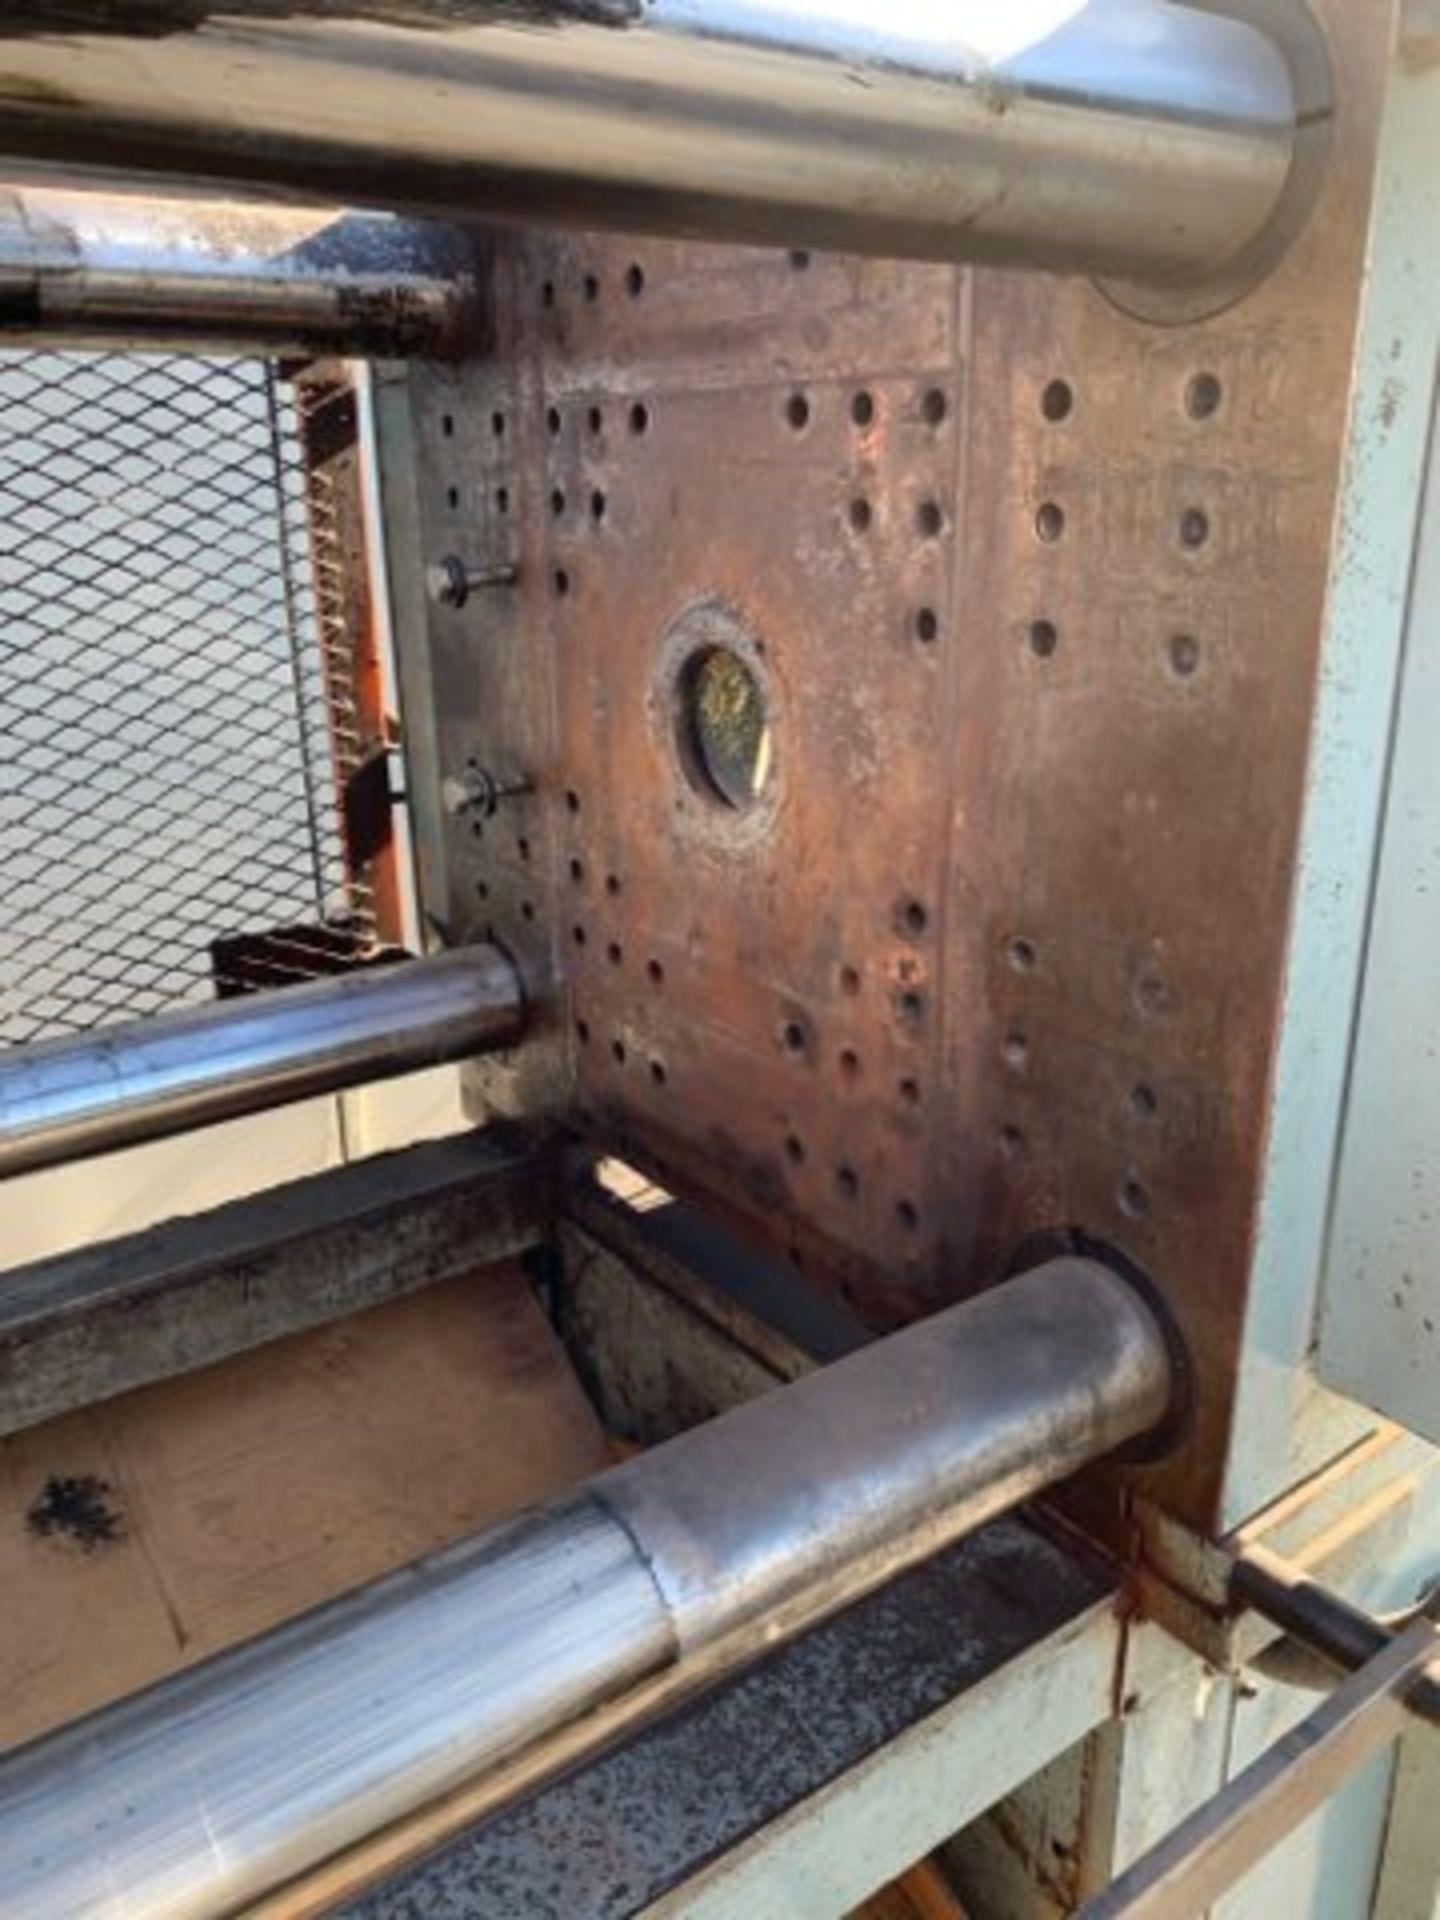 225 TON TOSHIBA ISC225N INJECTION MOLDING MACHINE - Image 4 of 4